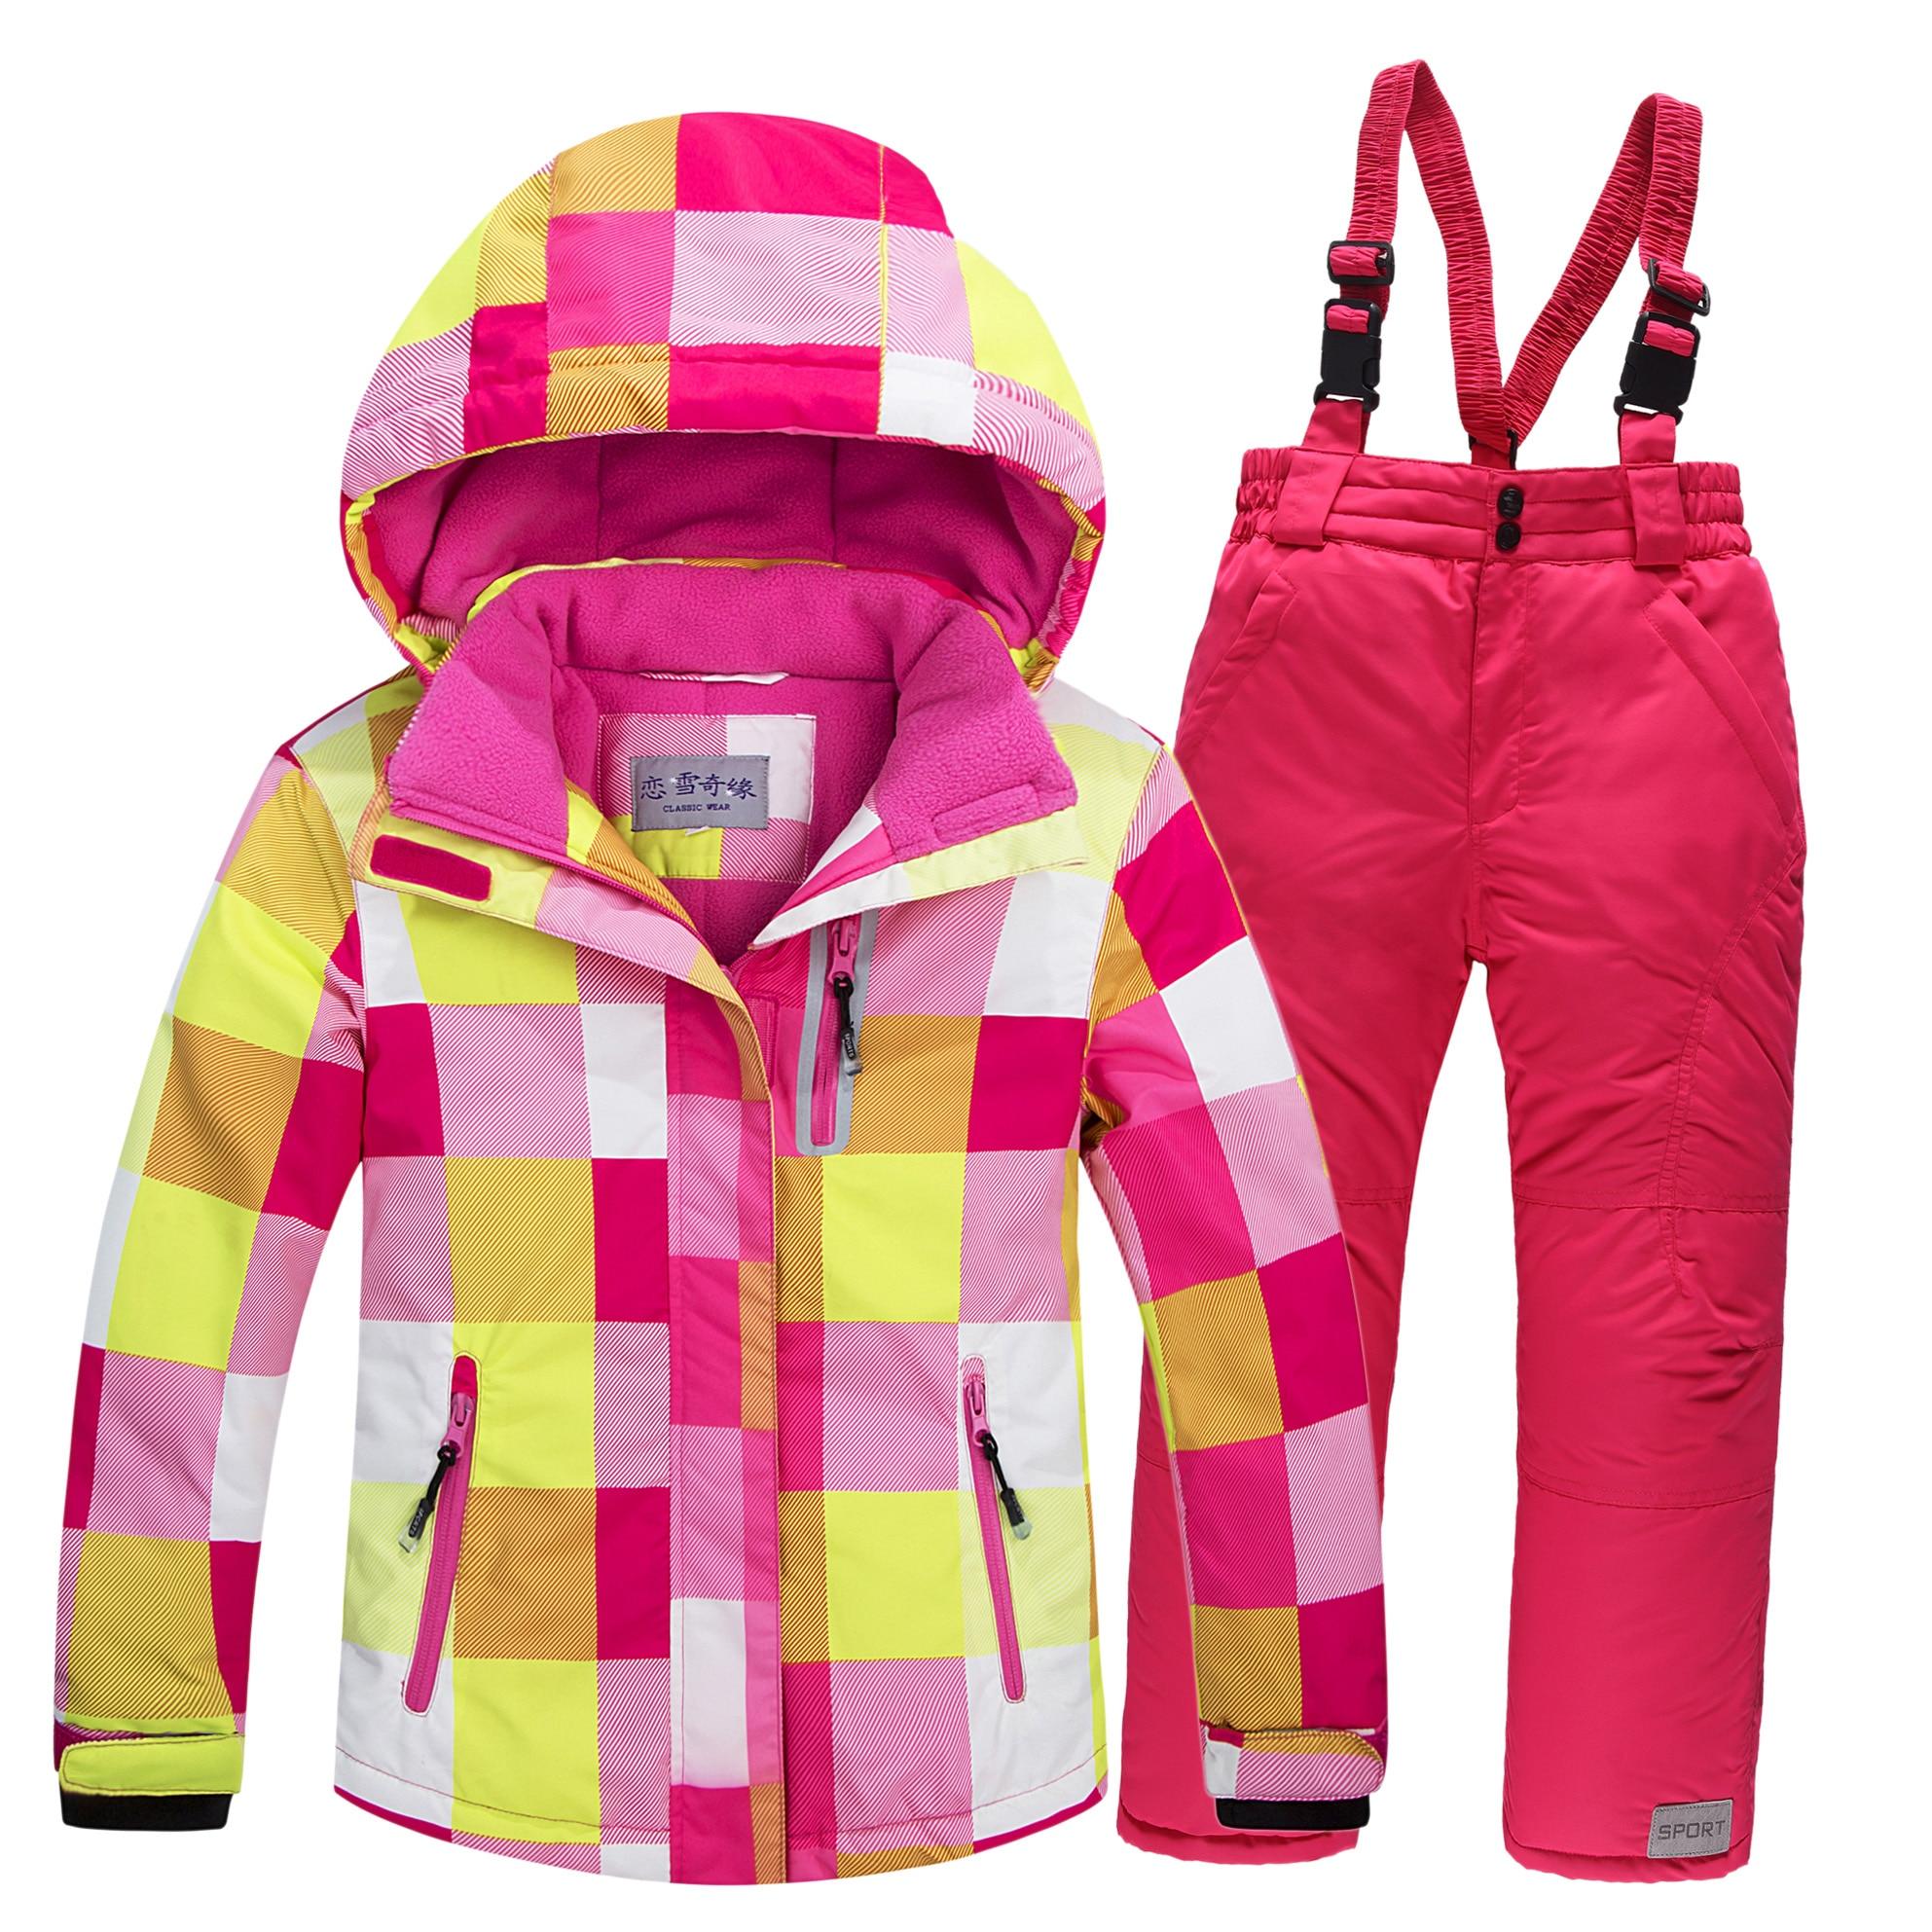 e9fd46b05 30 Degree Winter Children Outerwear Warm Thicken Coat Sporty Snow ...